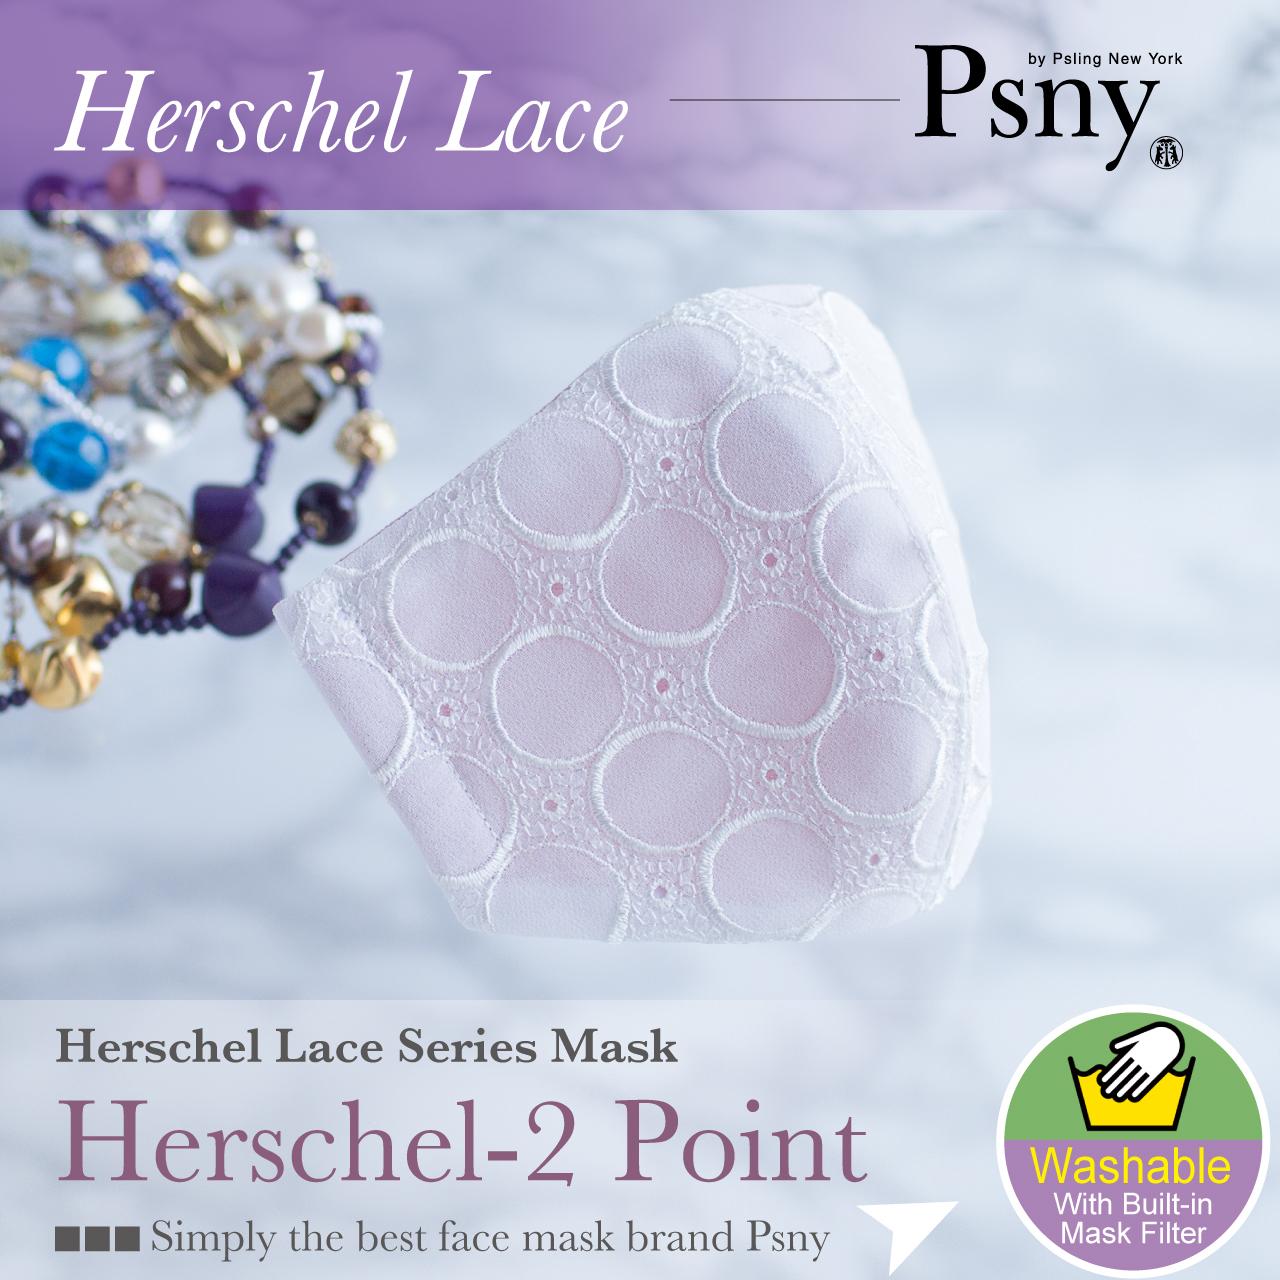 PSNY レース ハーシェル2・ポワン 花粉 黄砂 洗える不織布フィルター入り 立体 大人用 マスク 送料無料 LH3